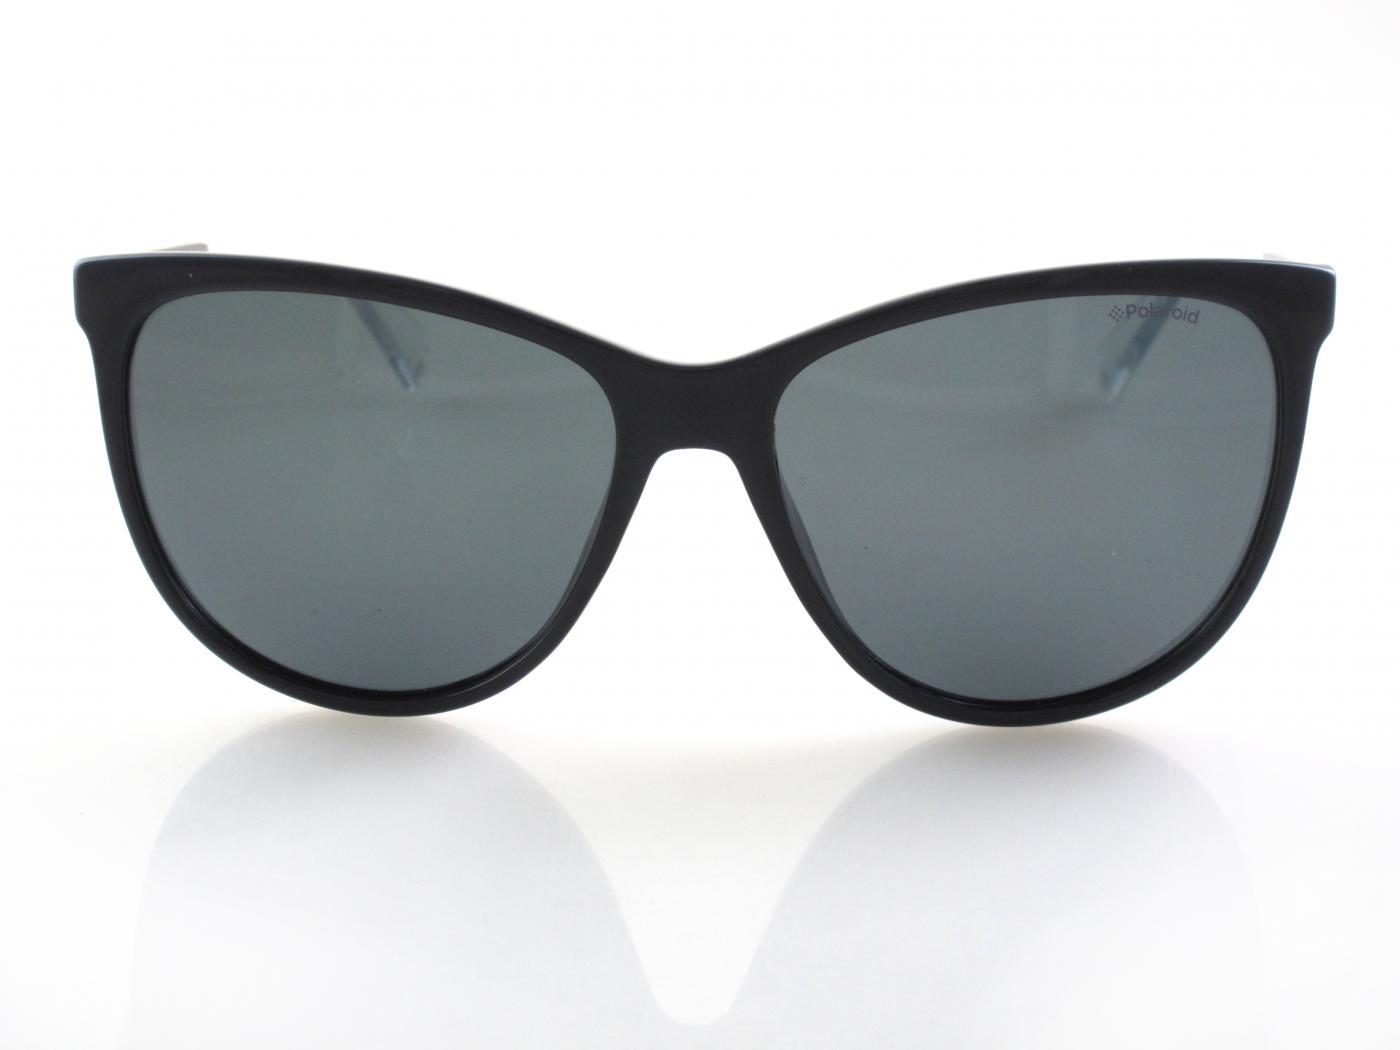 2805271d5 Dámske slnečné okuliare Polaroid | oftalens.sk